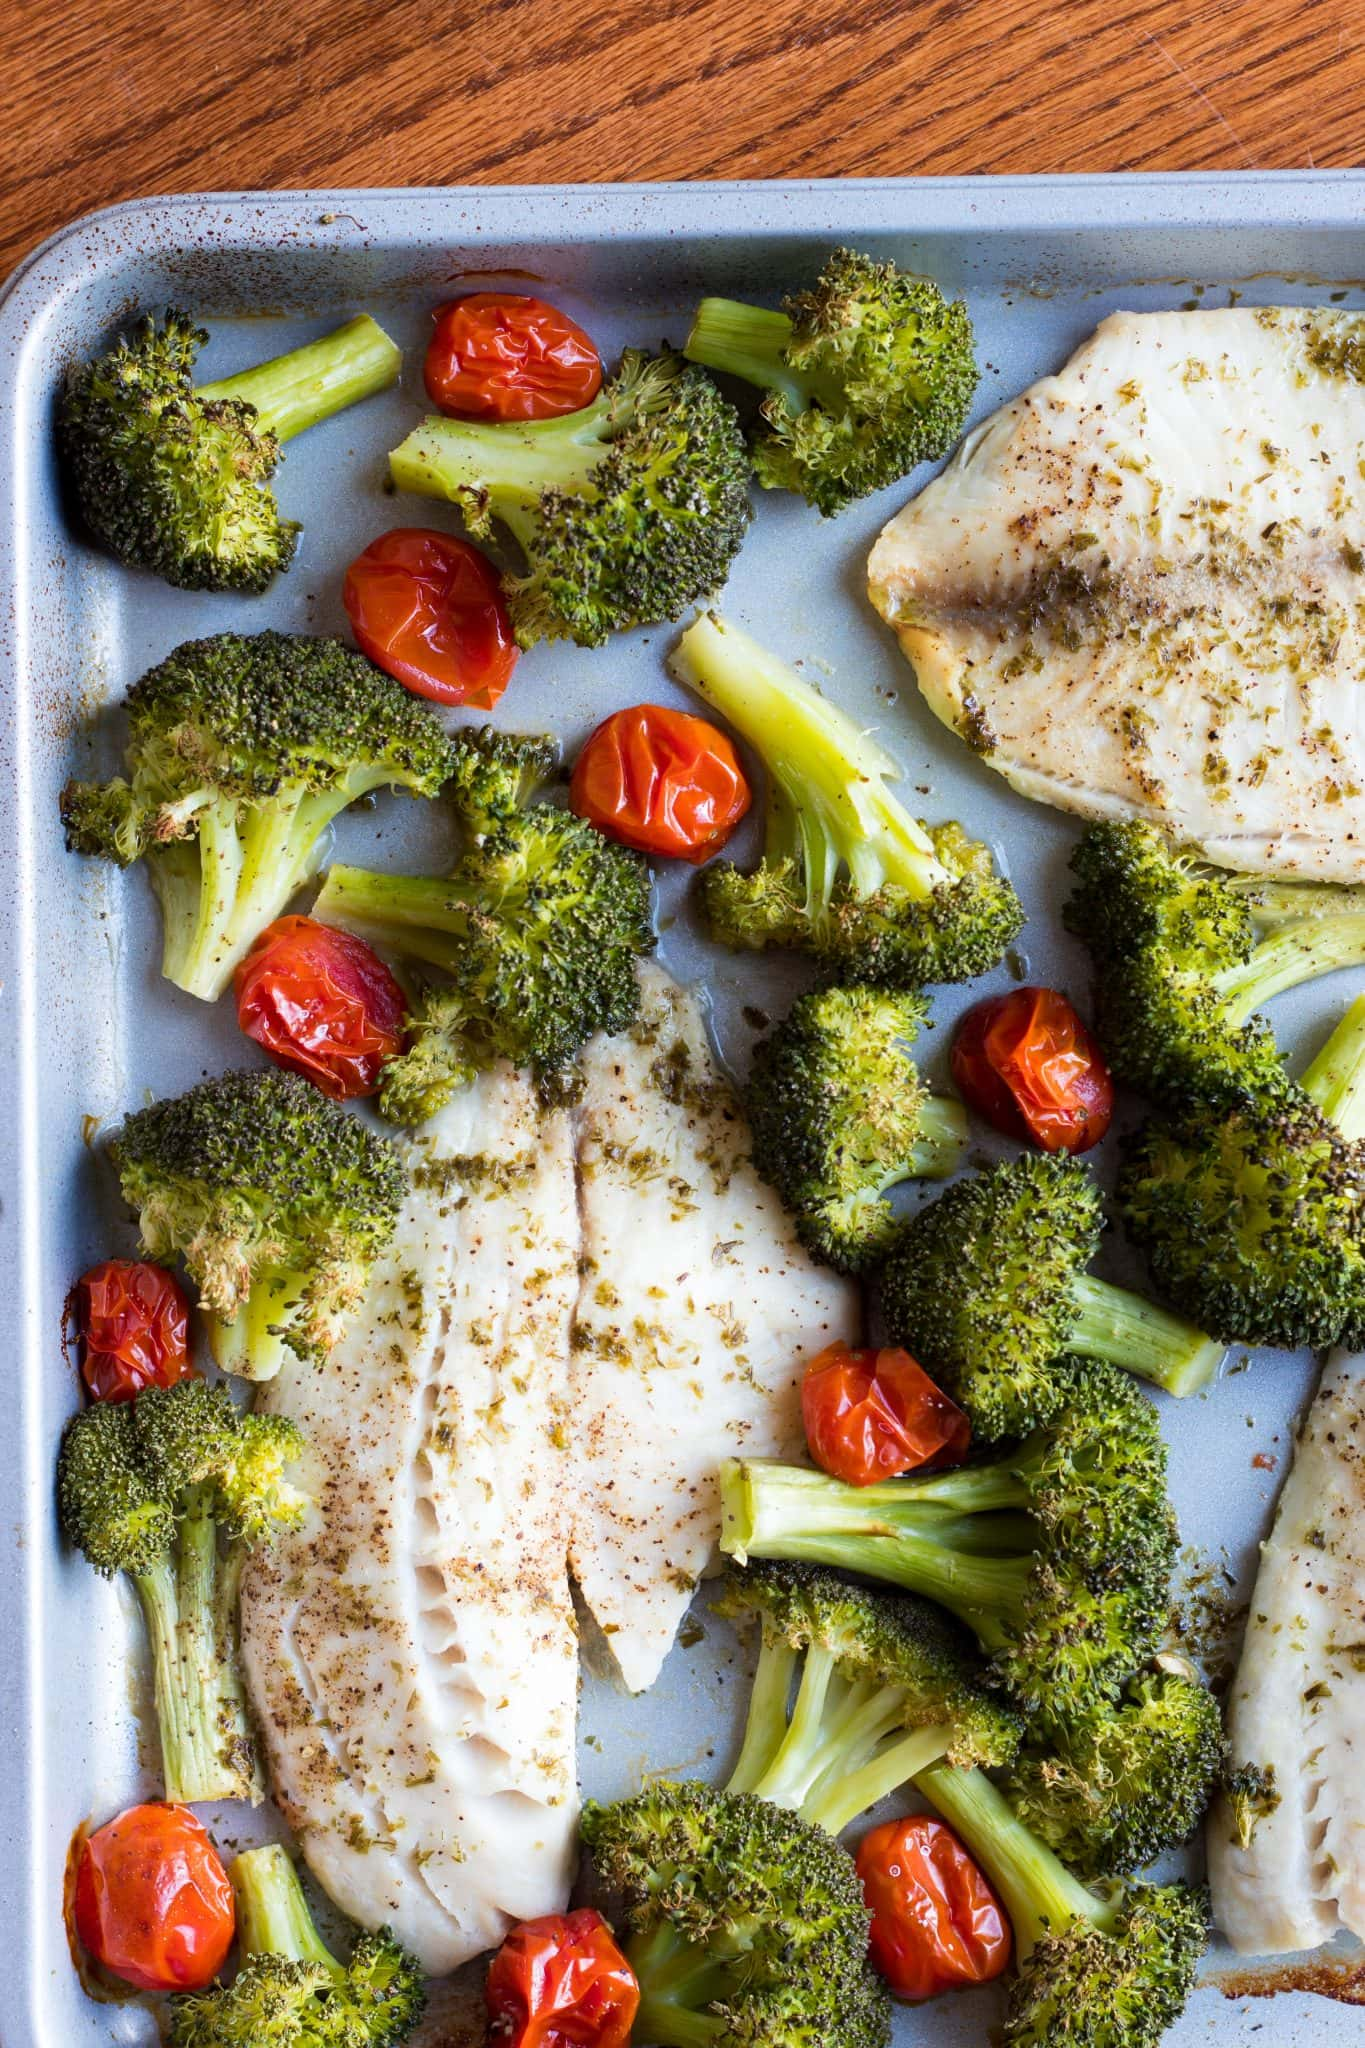 Roasted Tilapia and Broccoli